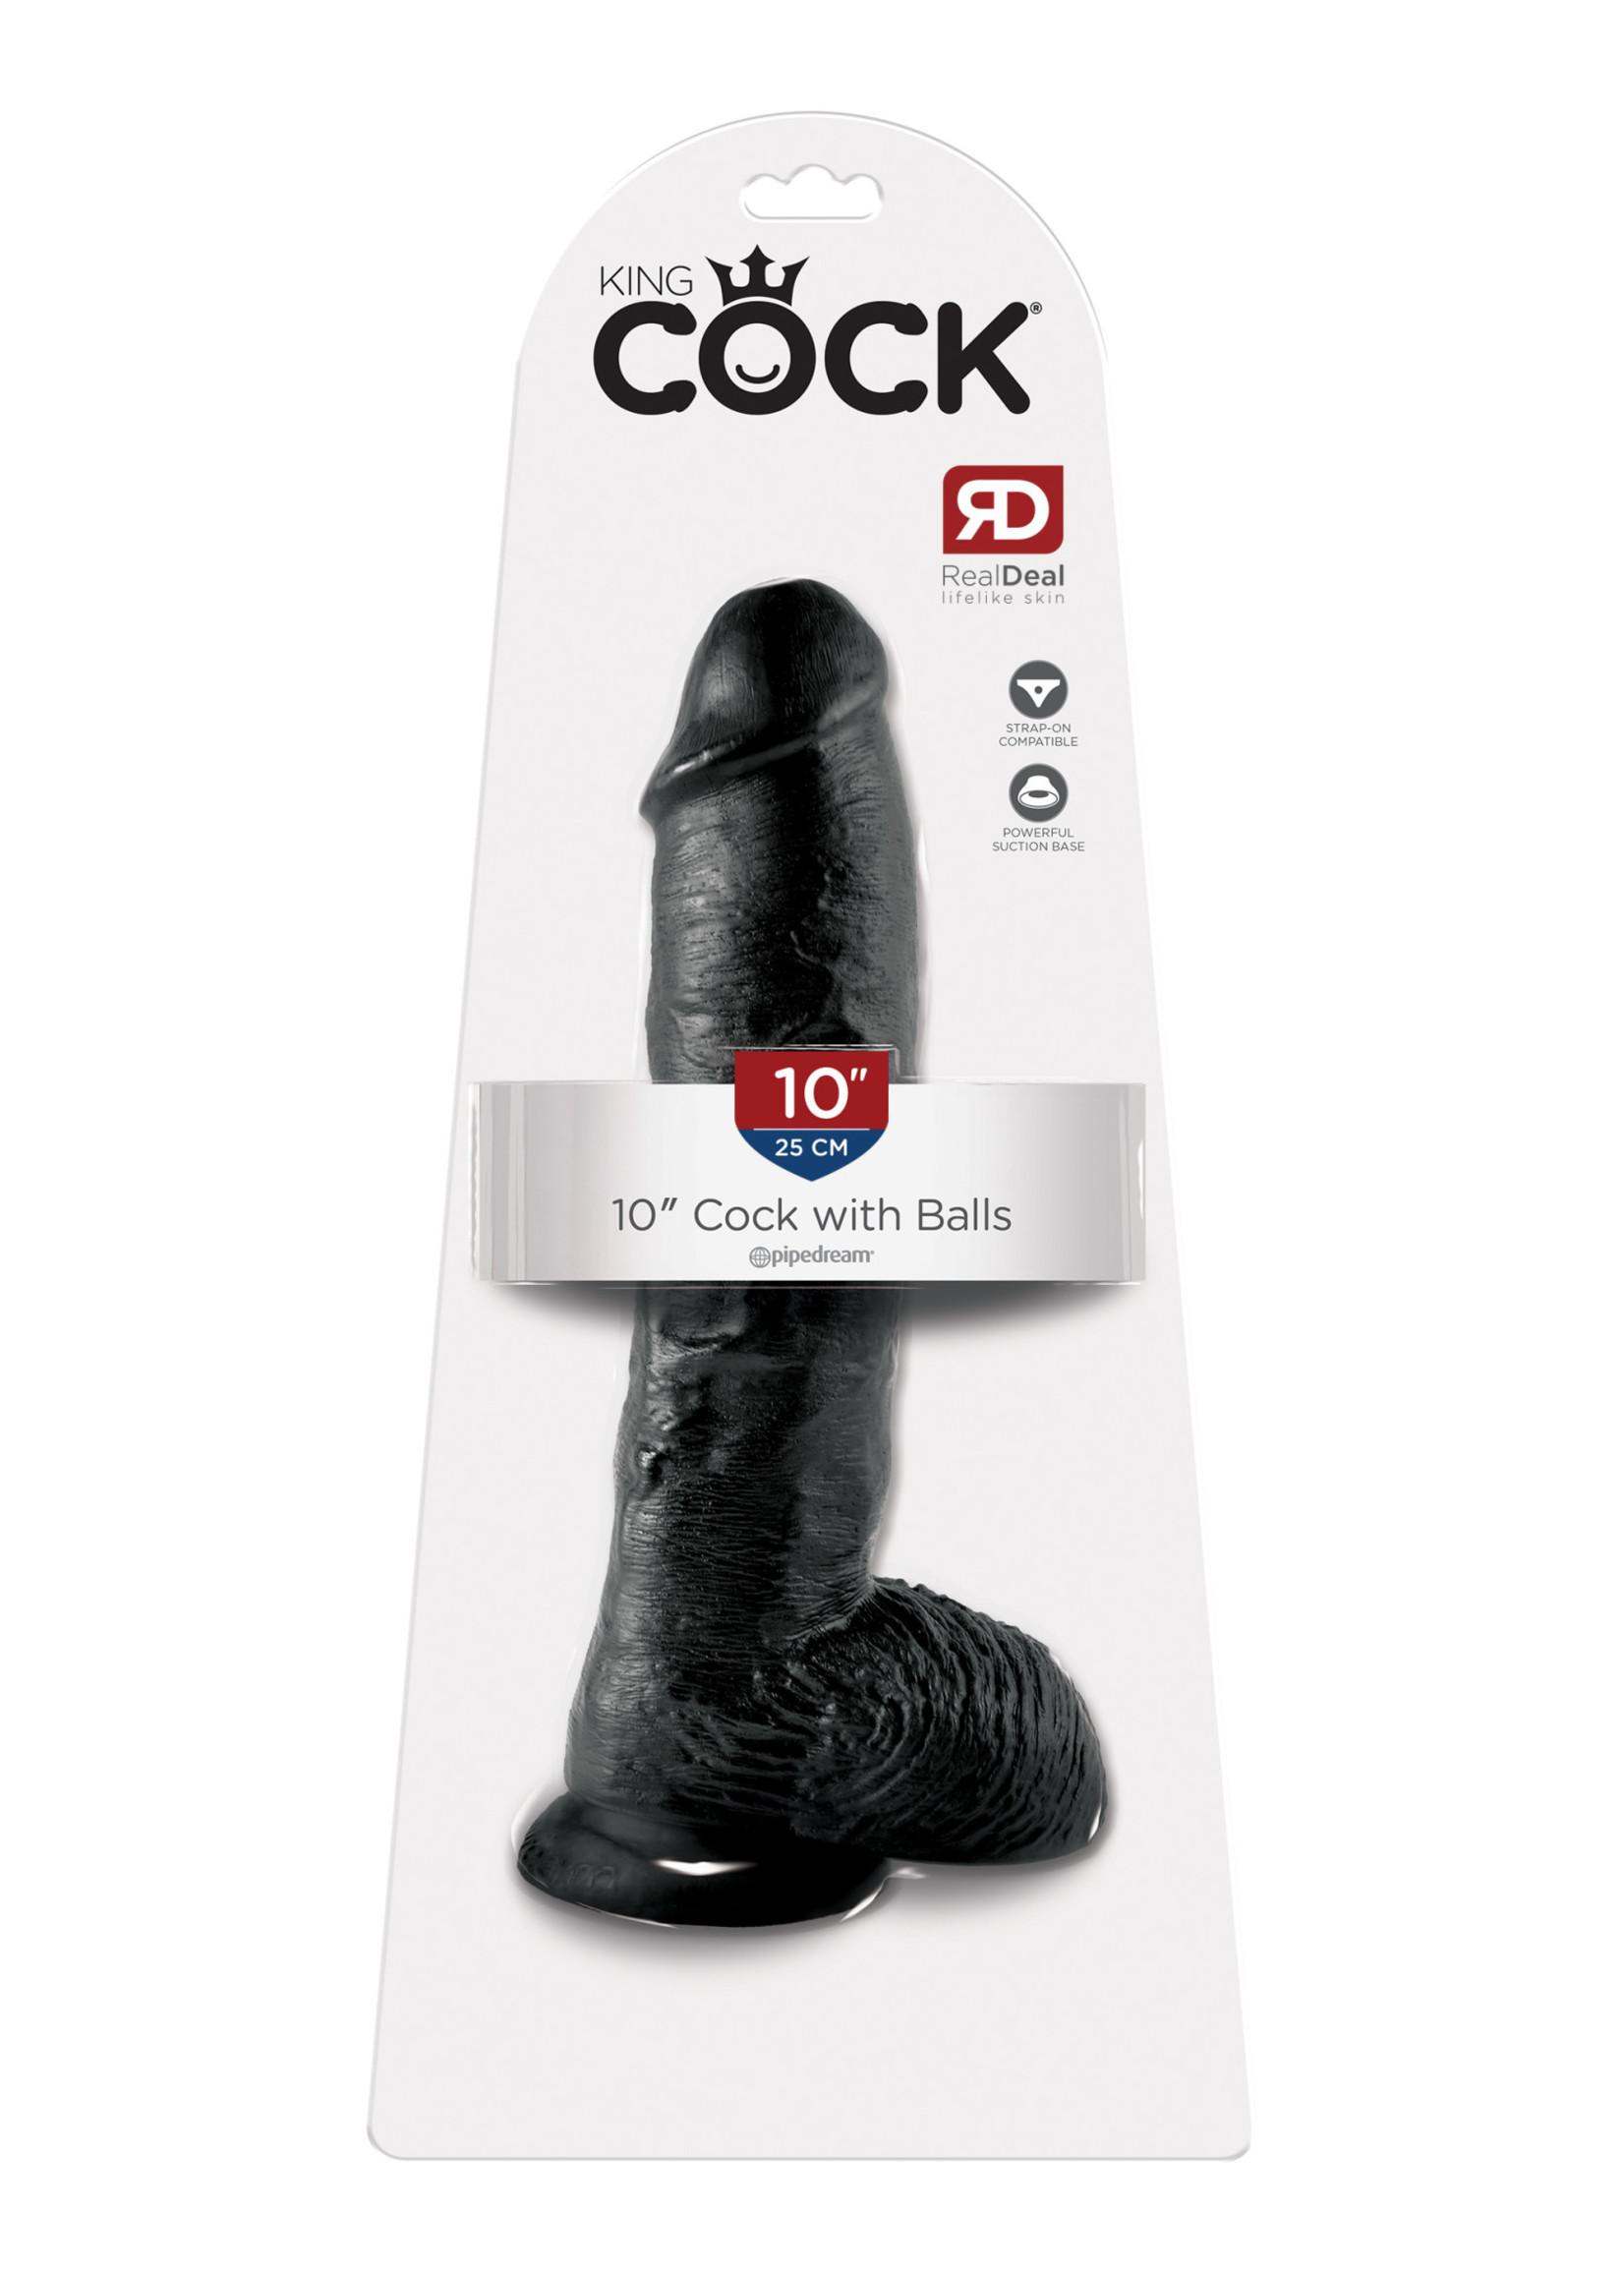 King Cock King Cock Dildo